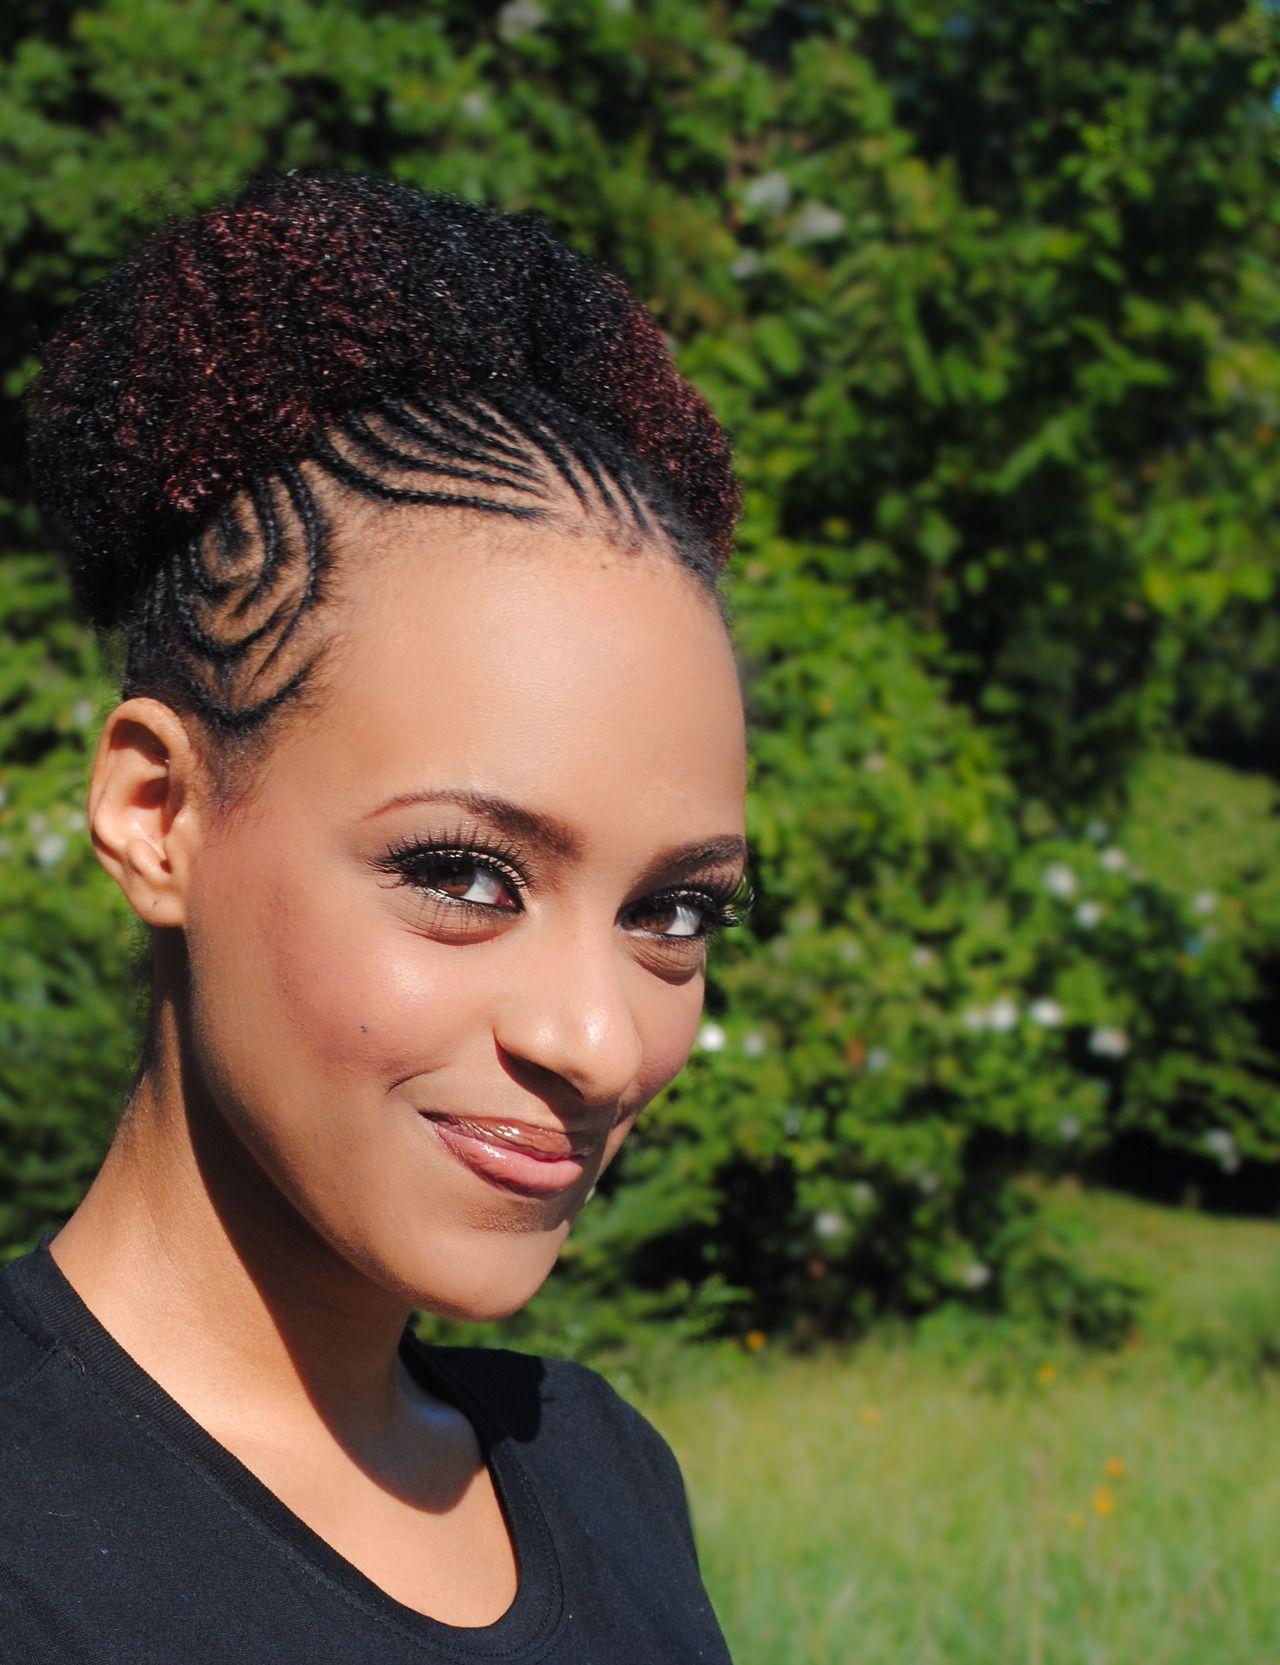 Awe Inspiring 1000 Images About Things I Love On Pinterest Black Women Short Hairstyles For Black Women Fulllsitofus